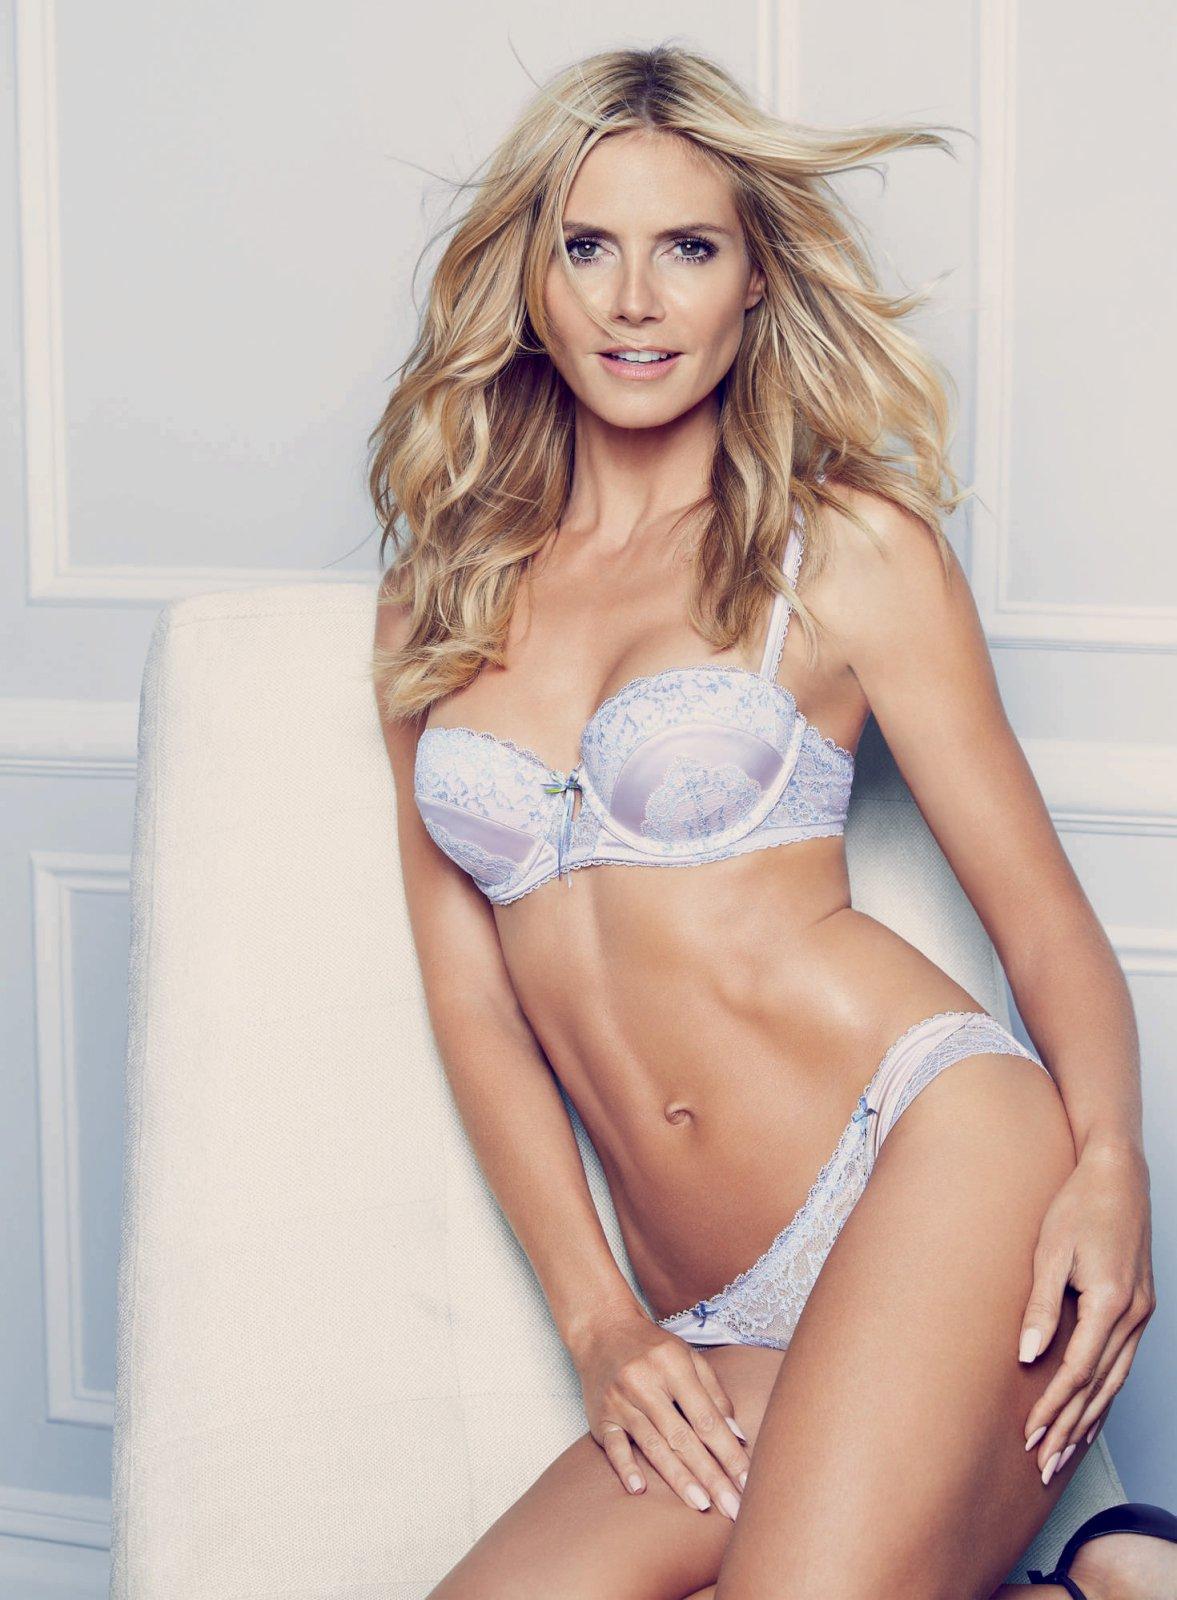 Heidi klum naked picture